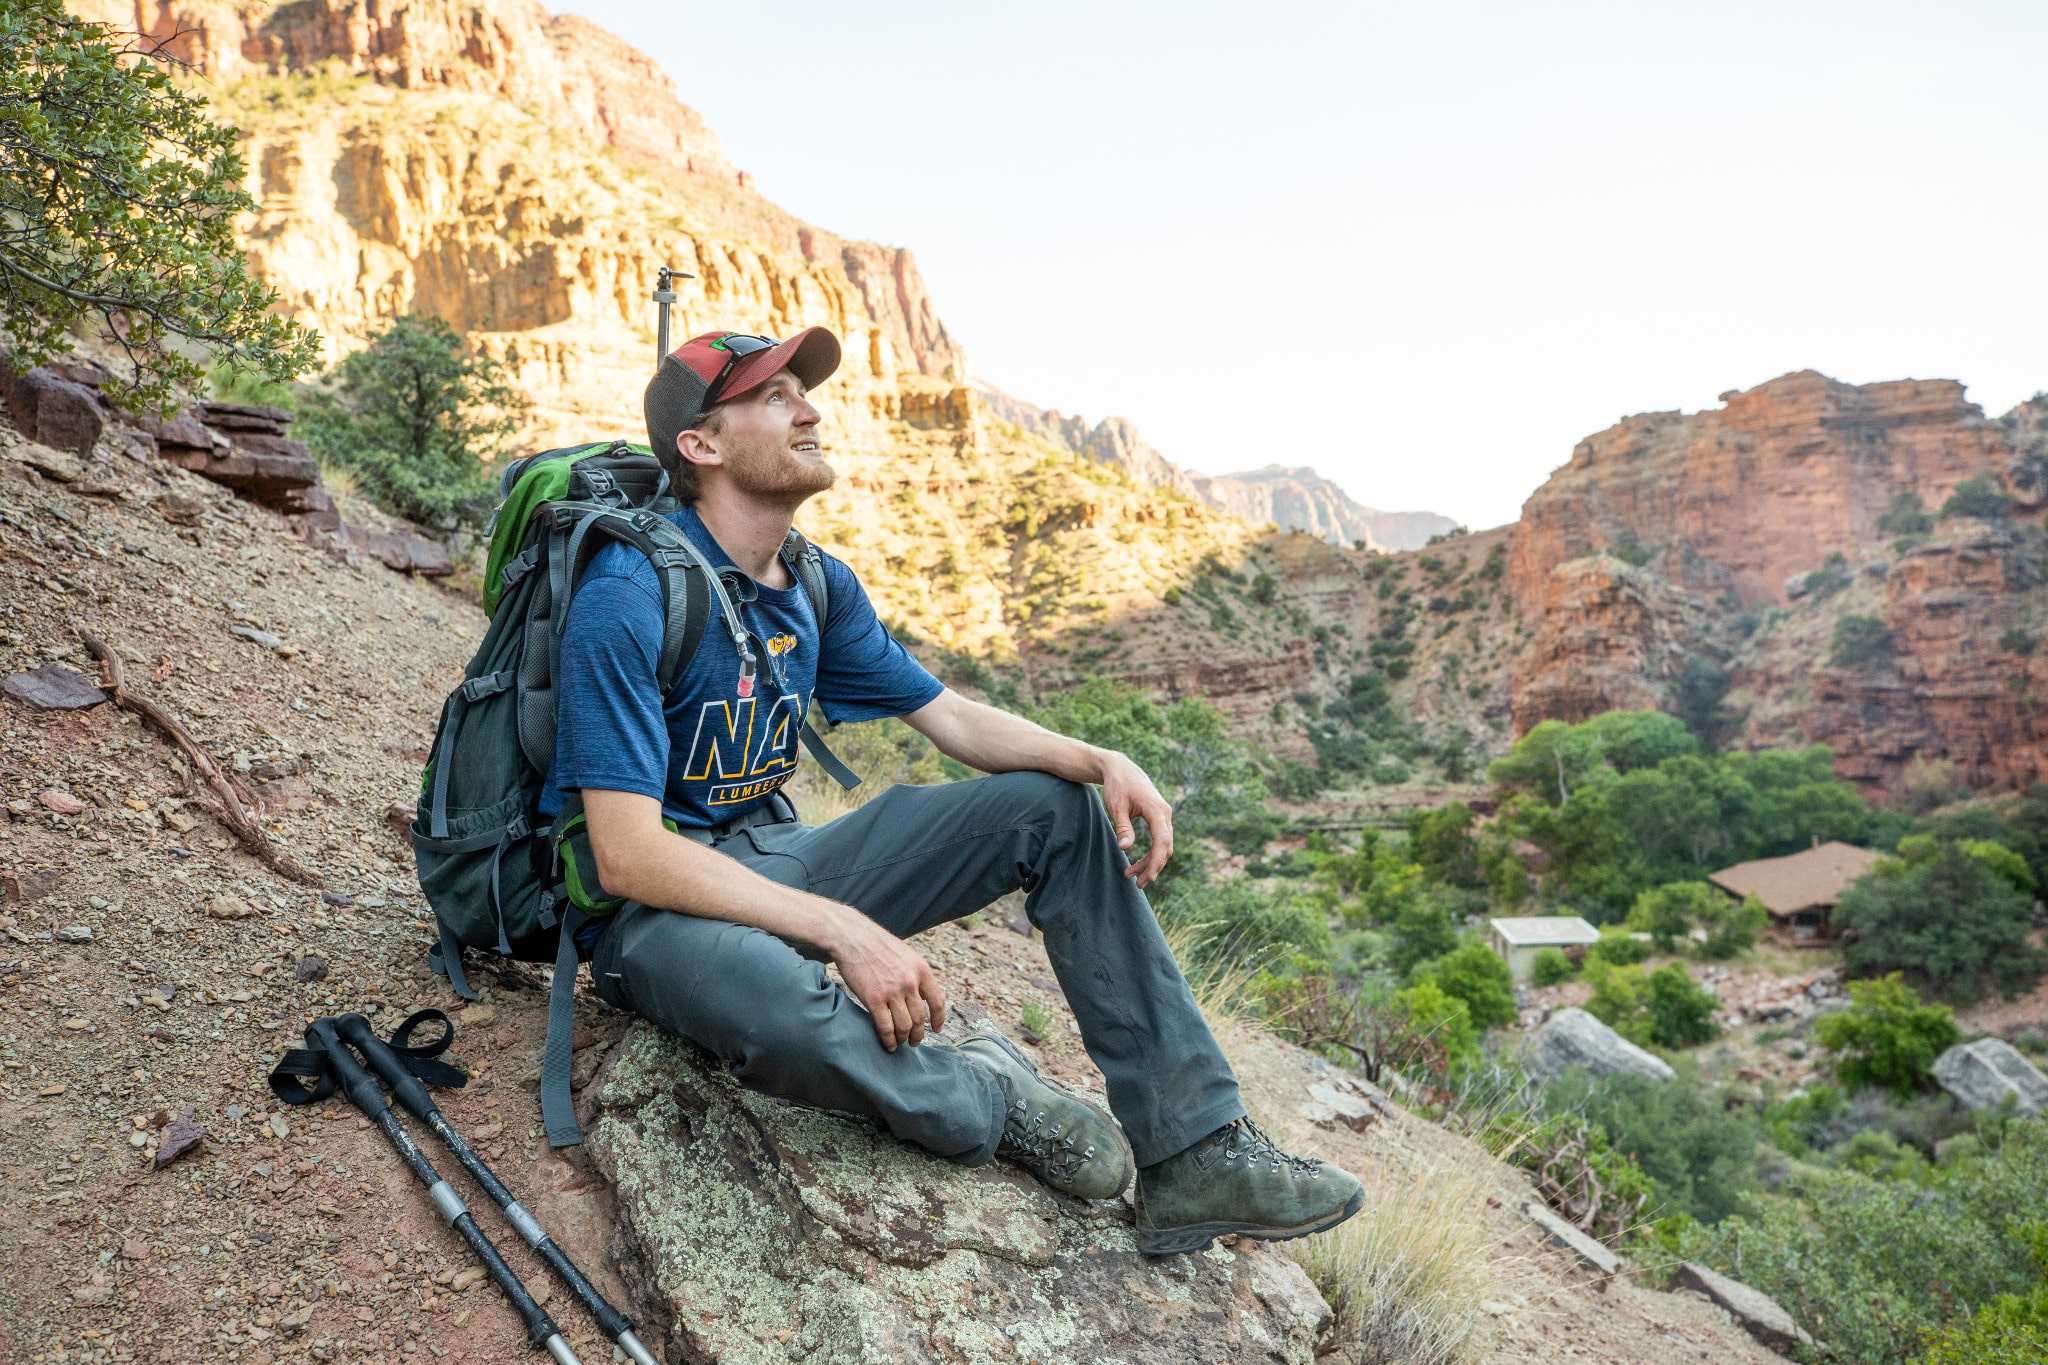 Swanson admires Grand Canyon